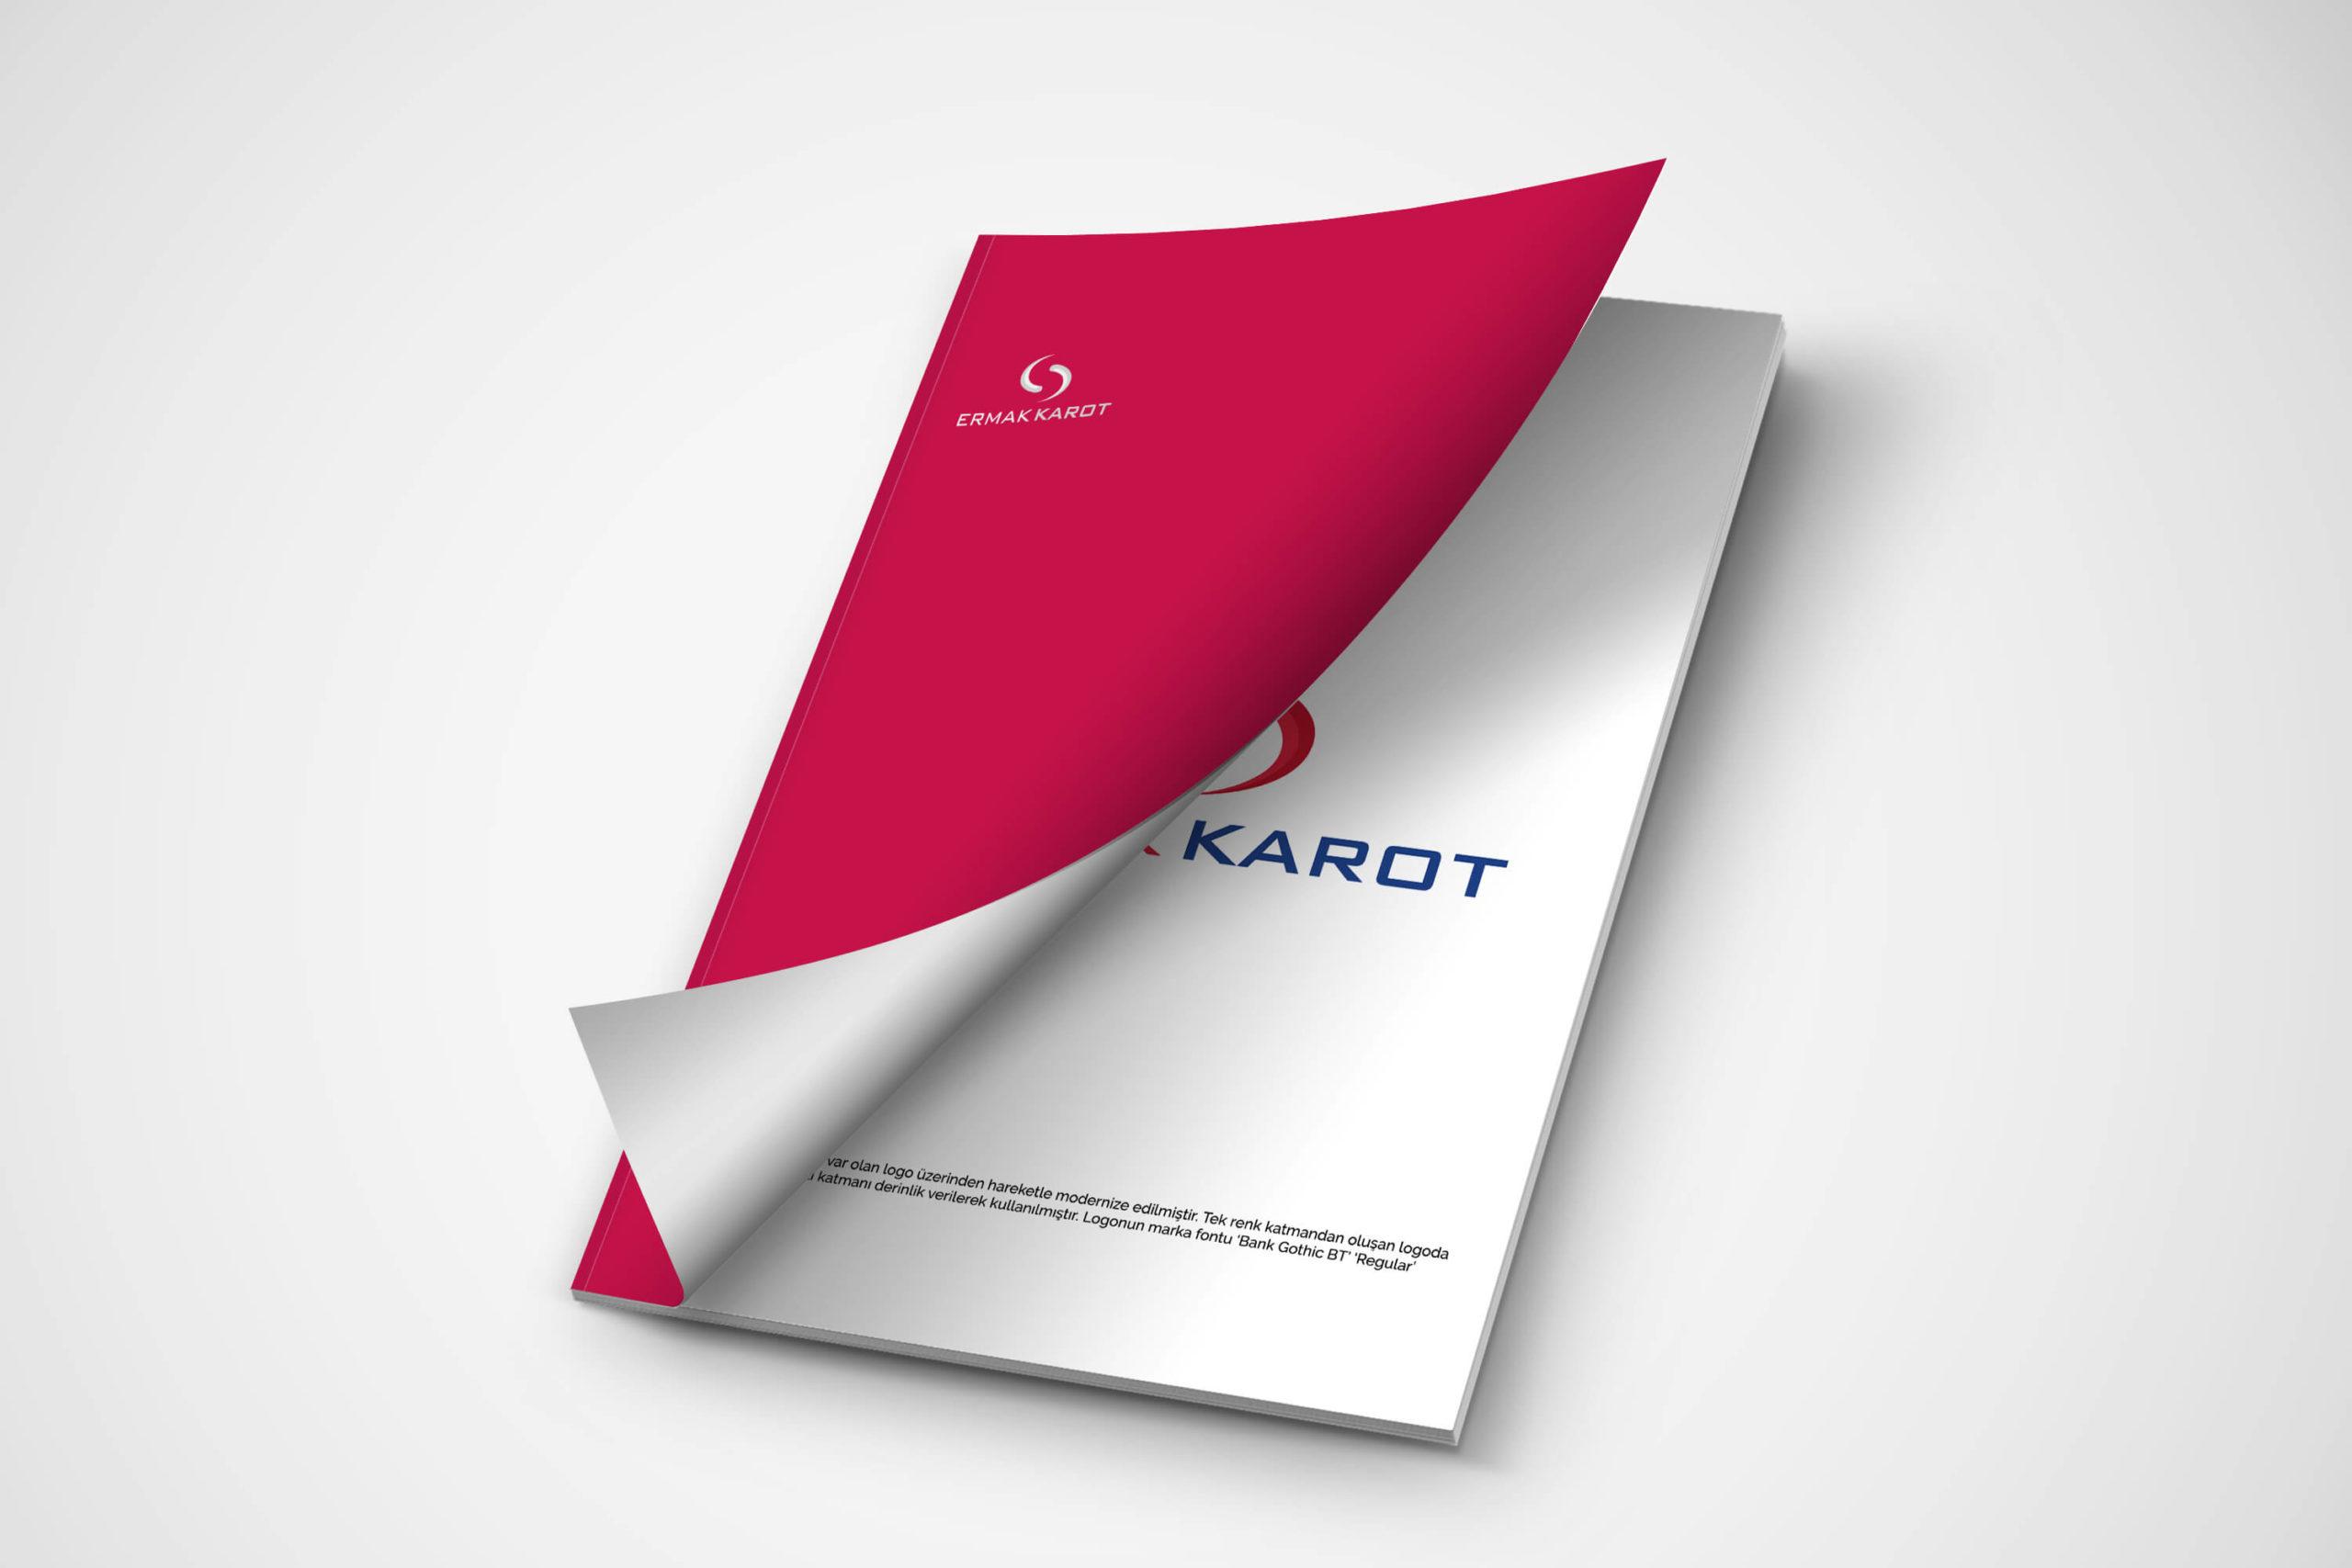 https://rdmedya.com/wp-content/uploads/2020/04/Ermak-Karot-Kurumsal-Kimlik-scaled.jpg